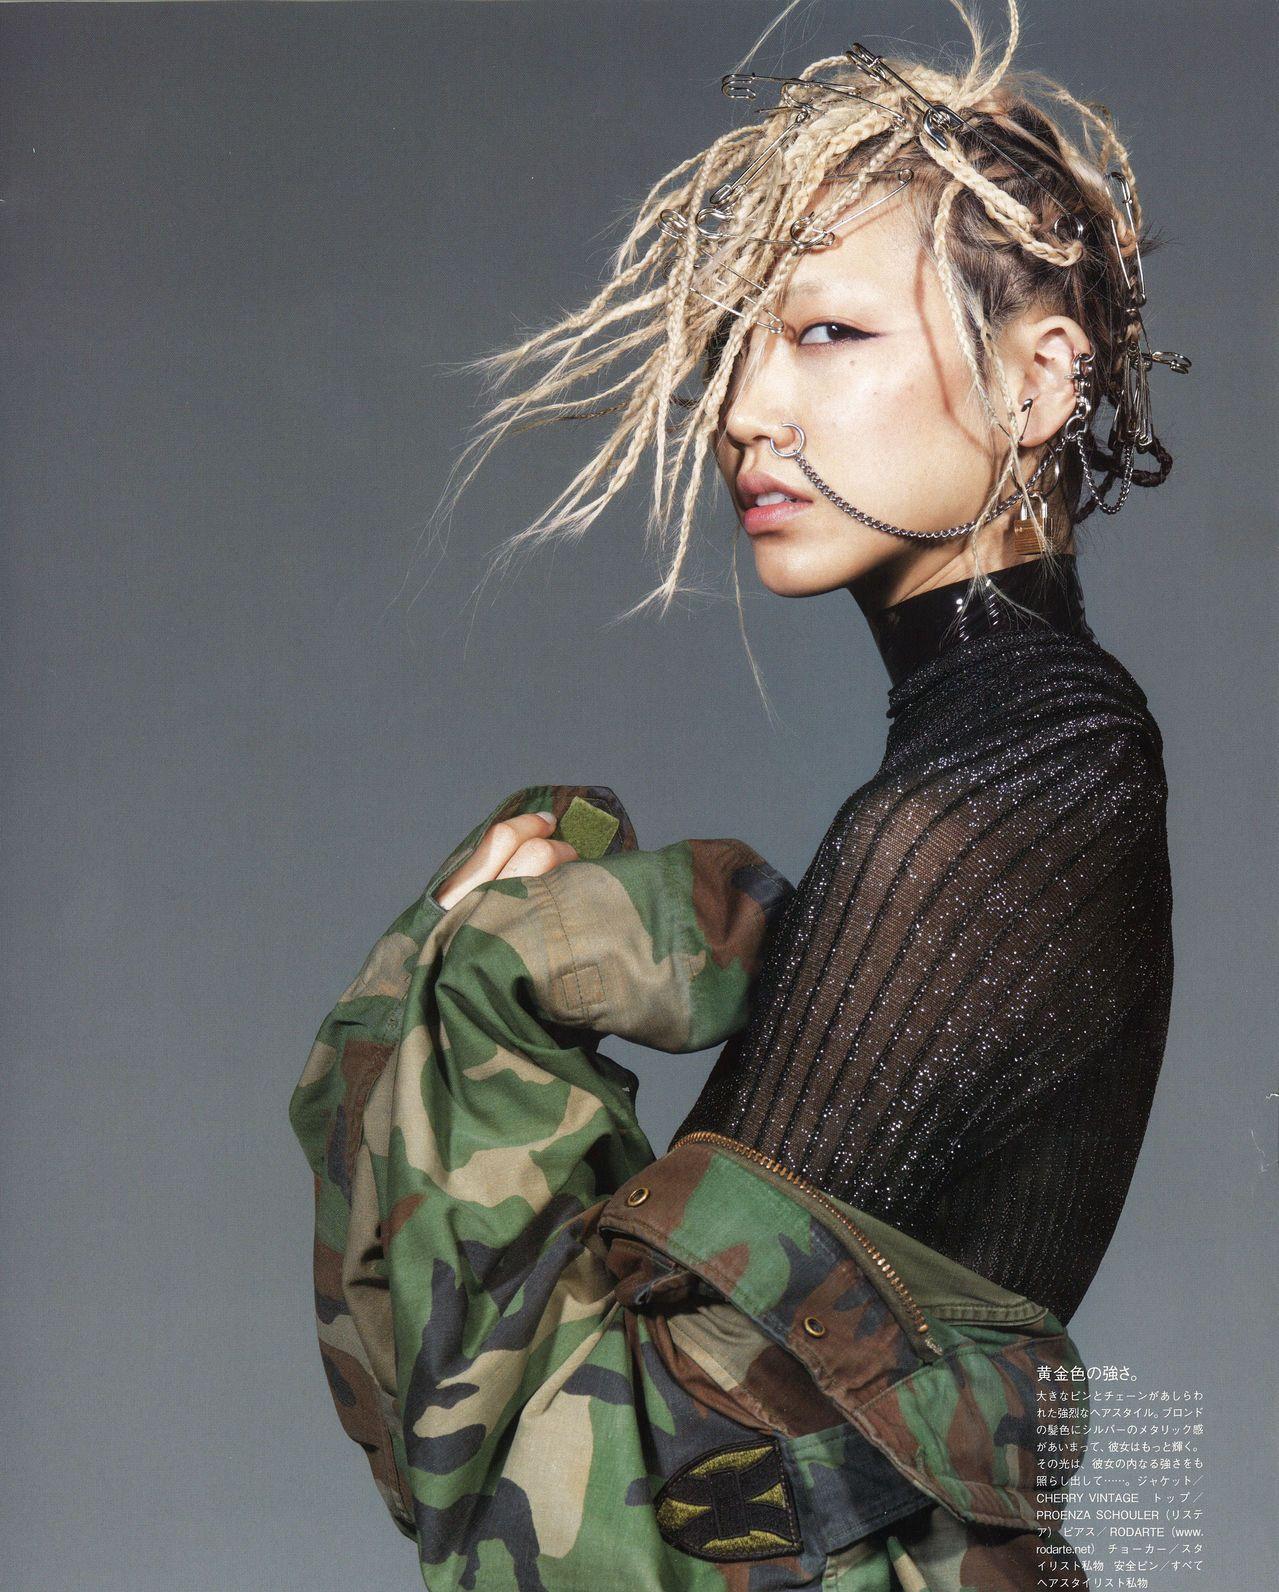 Korean Models: Photo | Han Guo Korea 한국어 | Fashion, Vogue ...